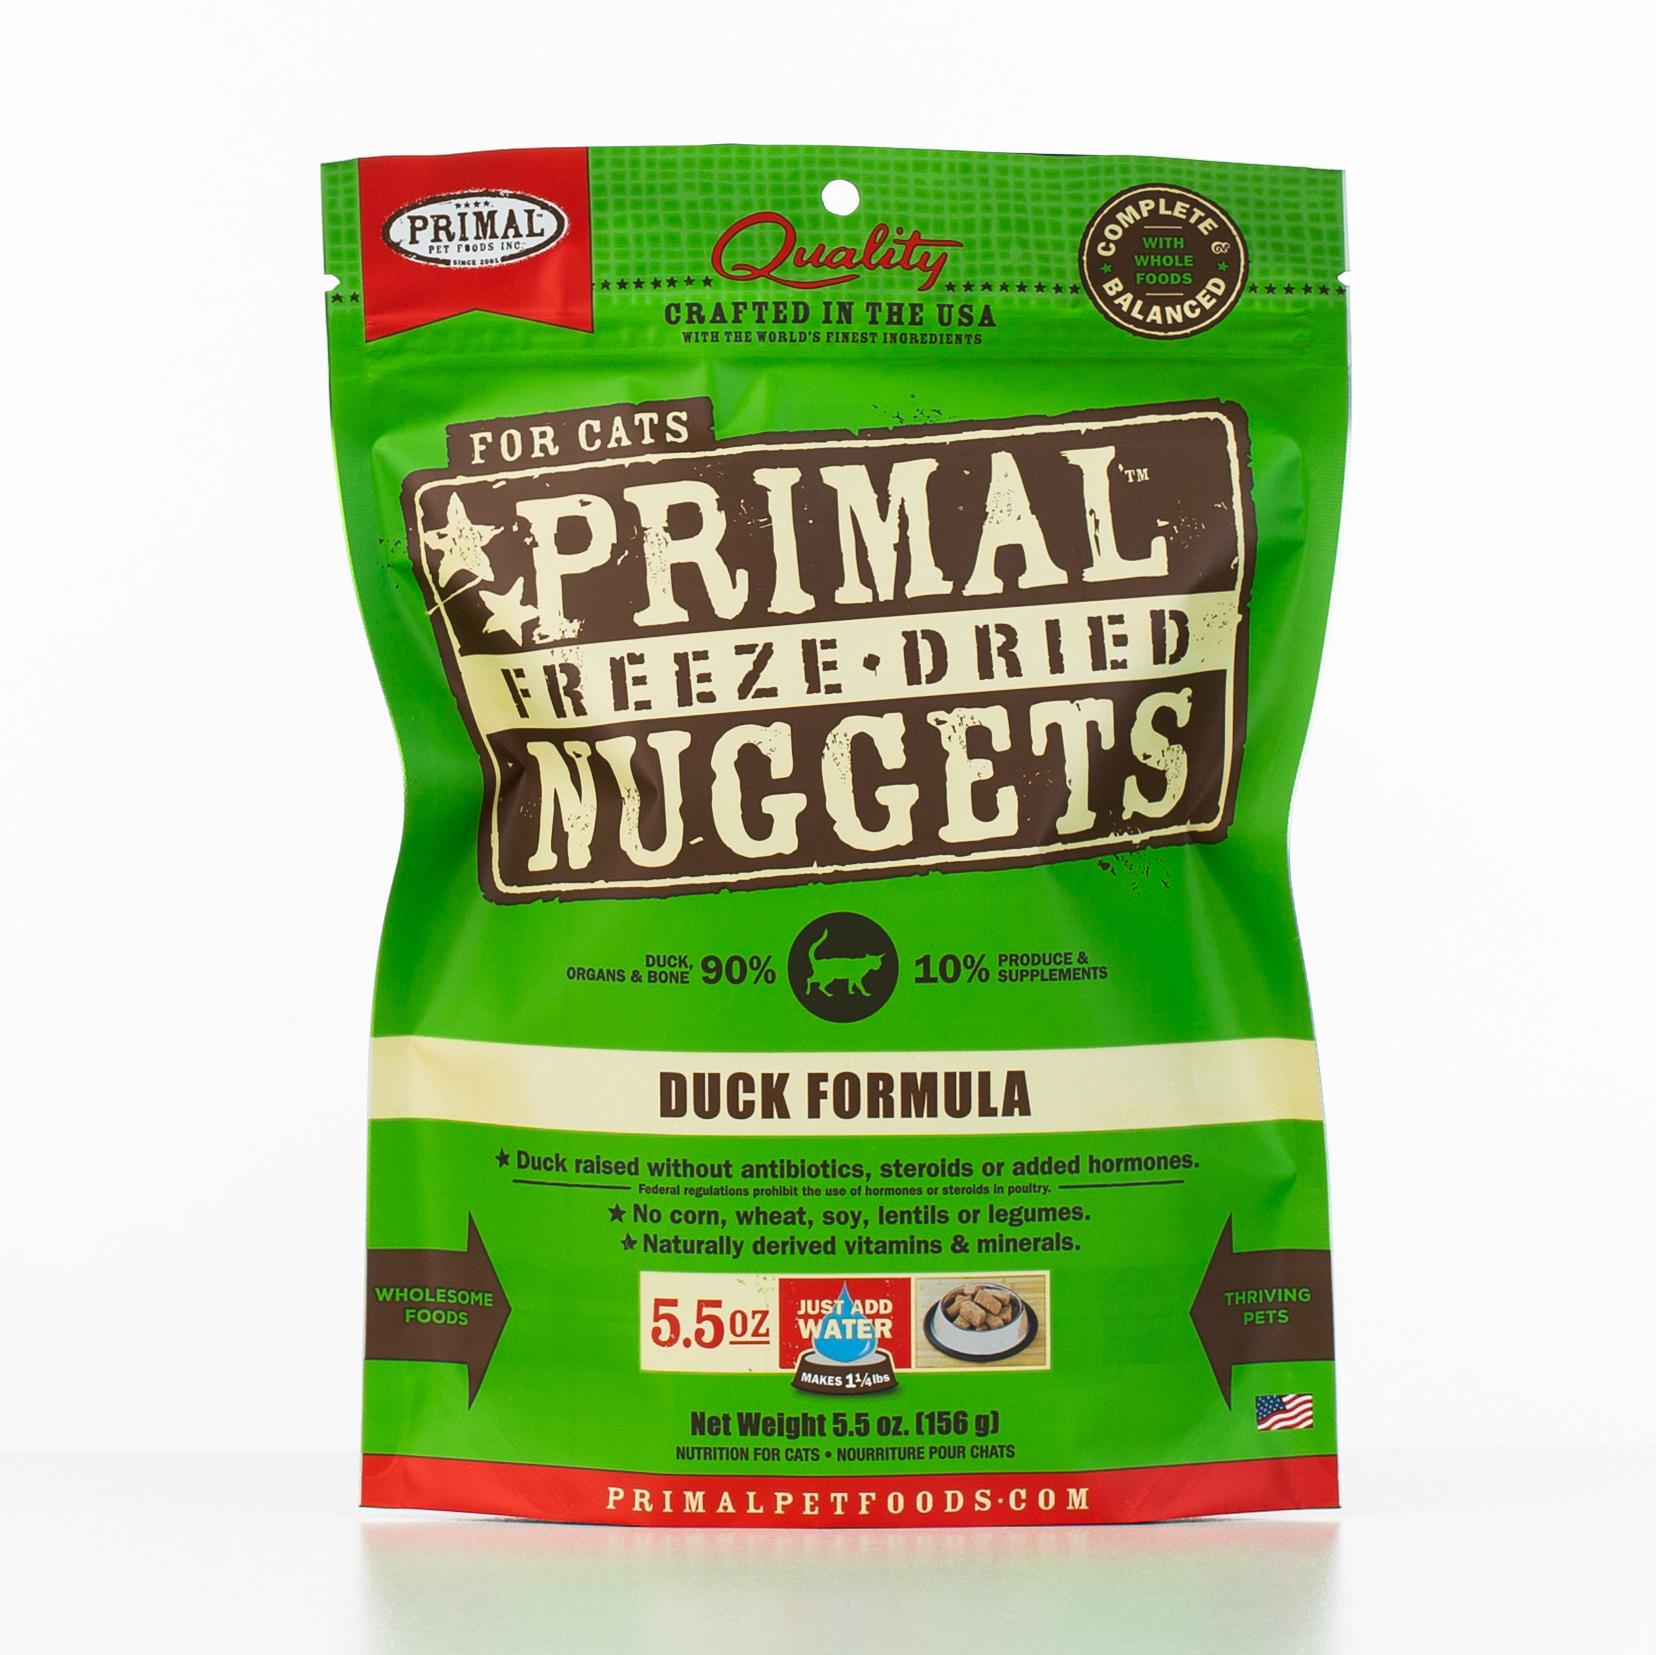 Primal Raw Freeze-Dried Nuggets Duck Formula Cat Food, 5.5-oz bag